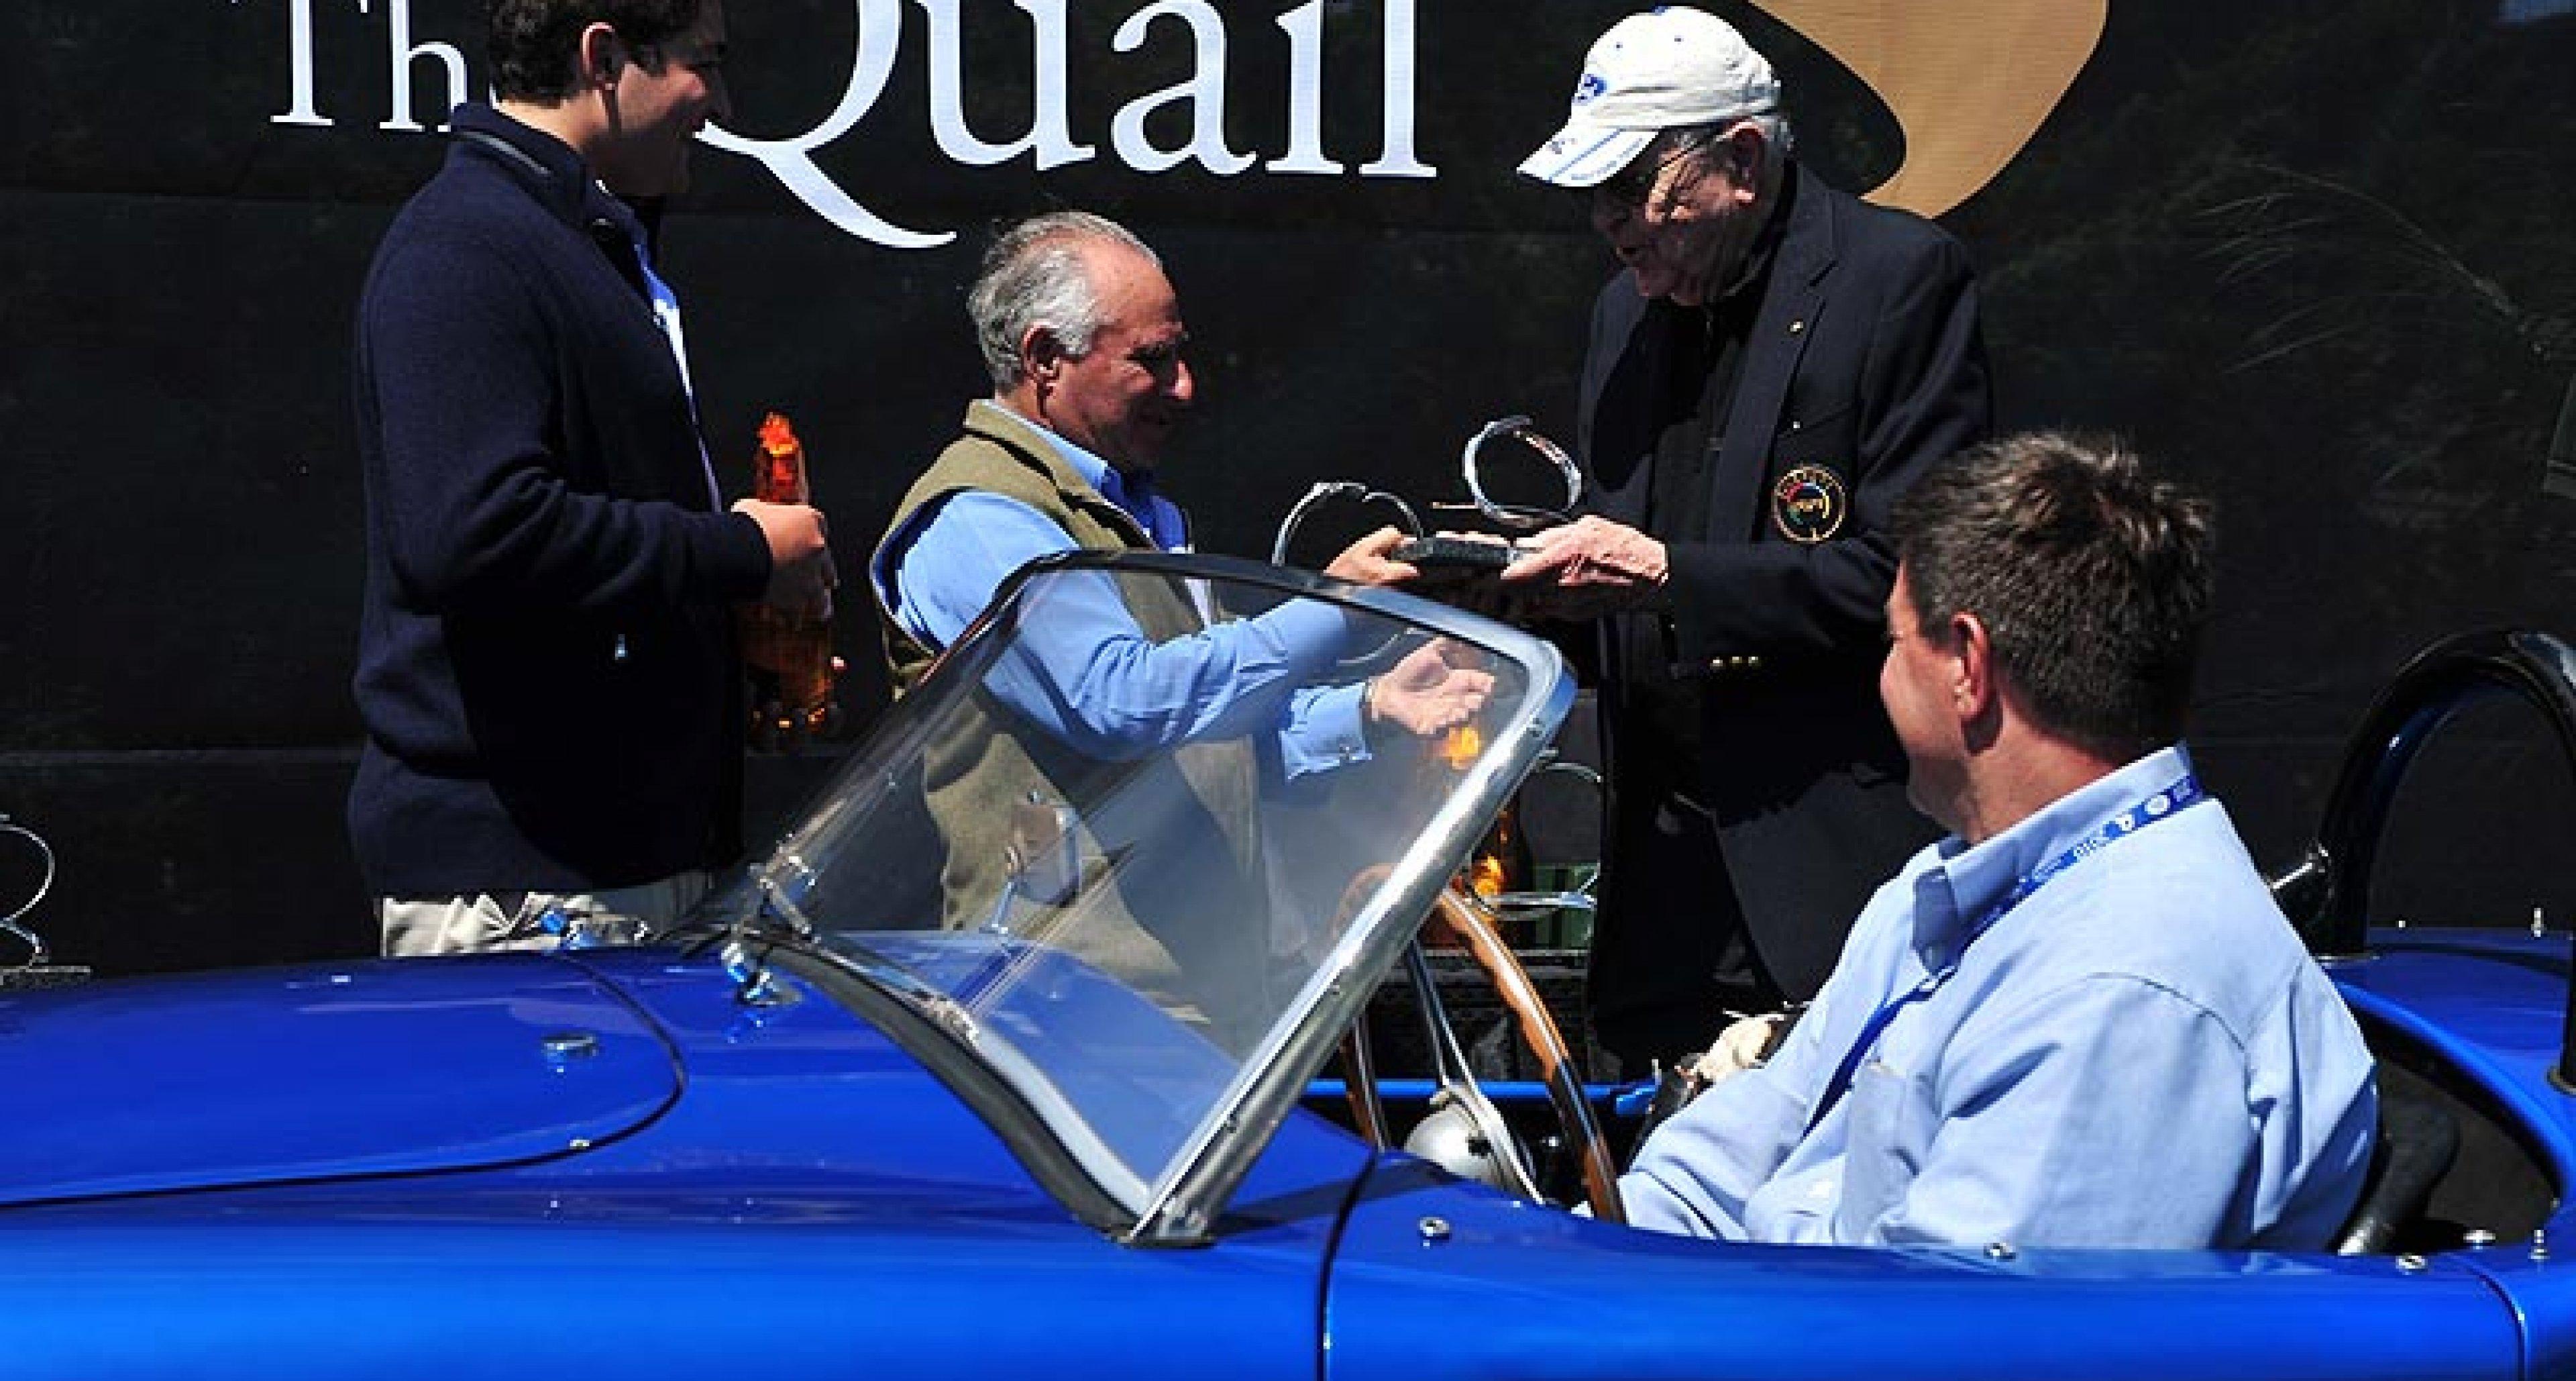 The Quail  'A Motorsports Gathering' 2010